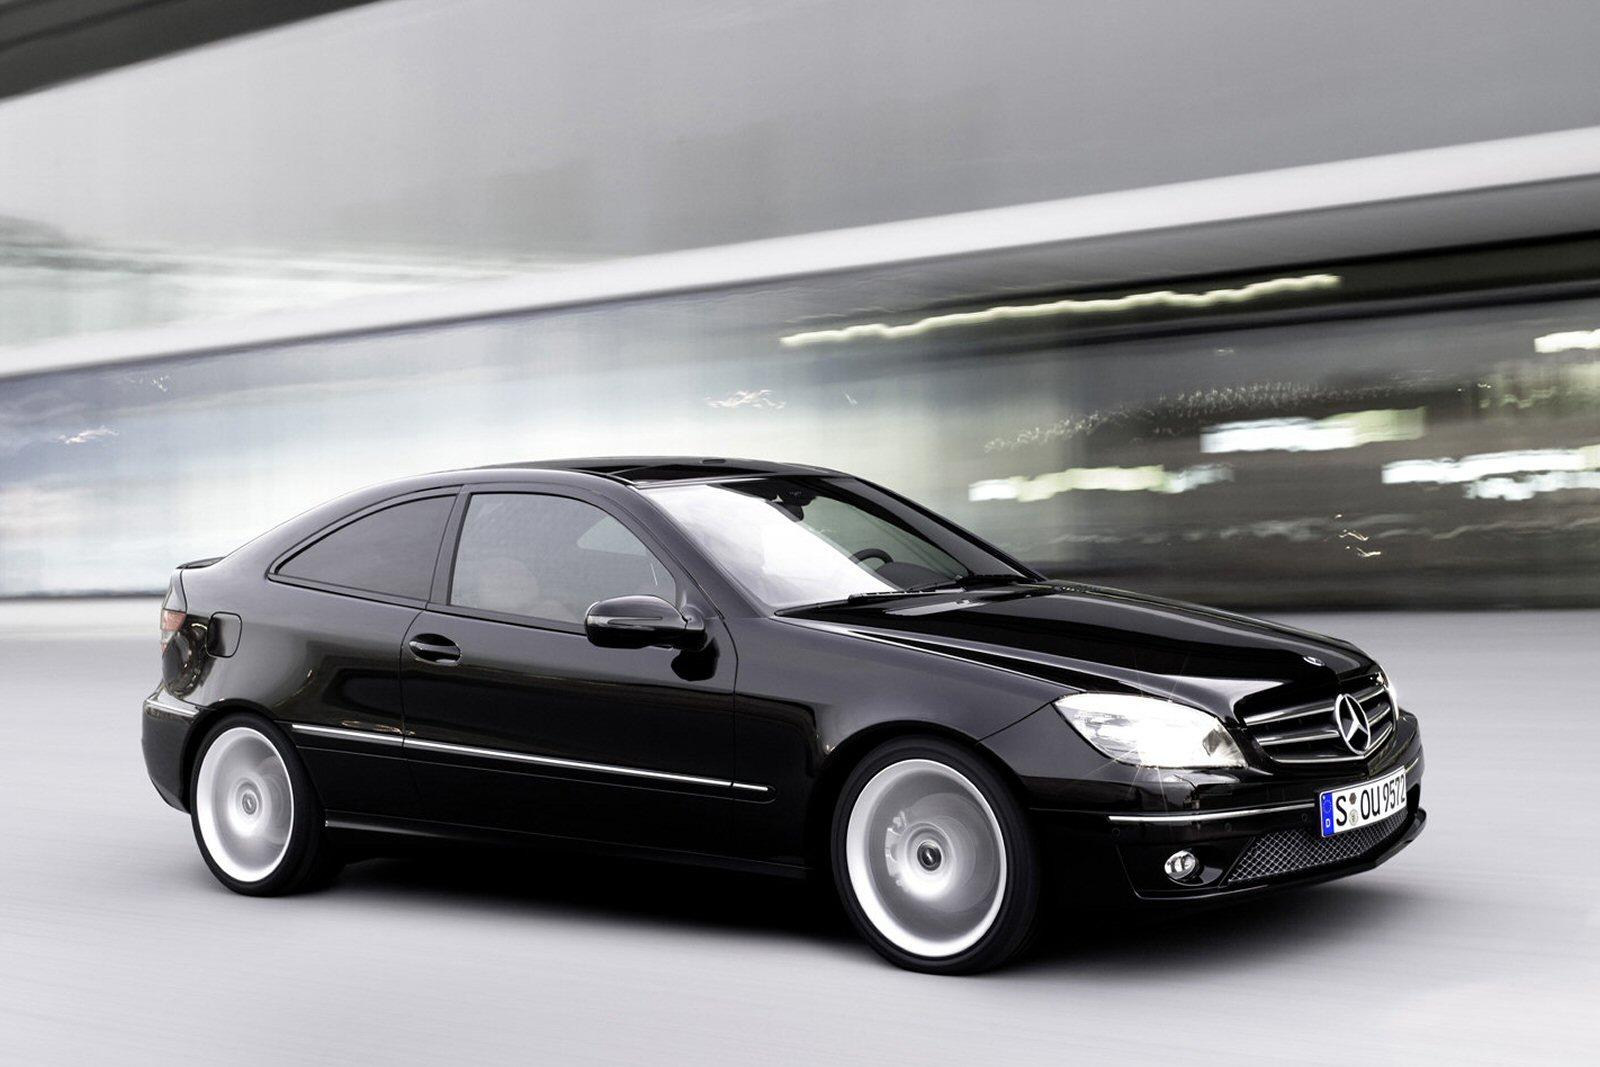 Mercedes-Benz CLC 200 technical details, history, photos on Better Parts LTD